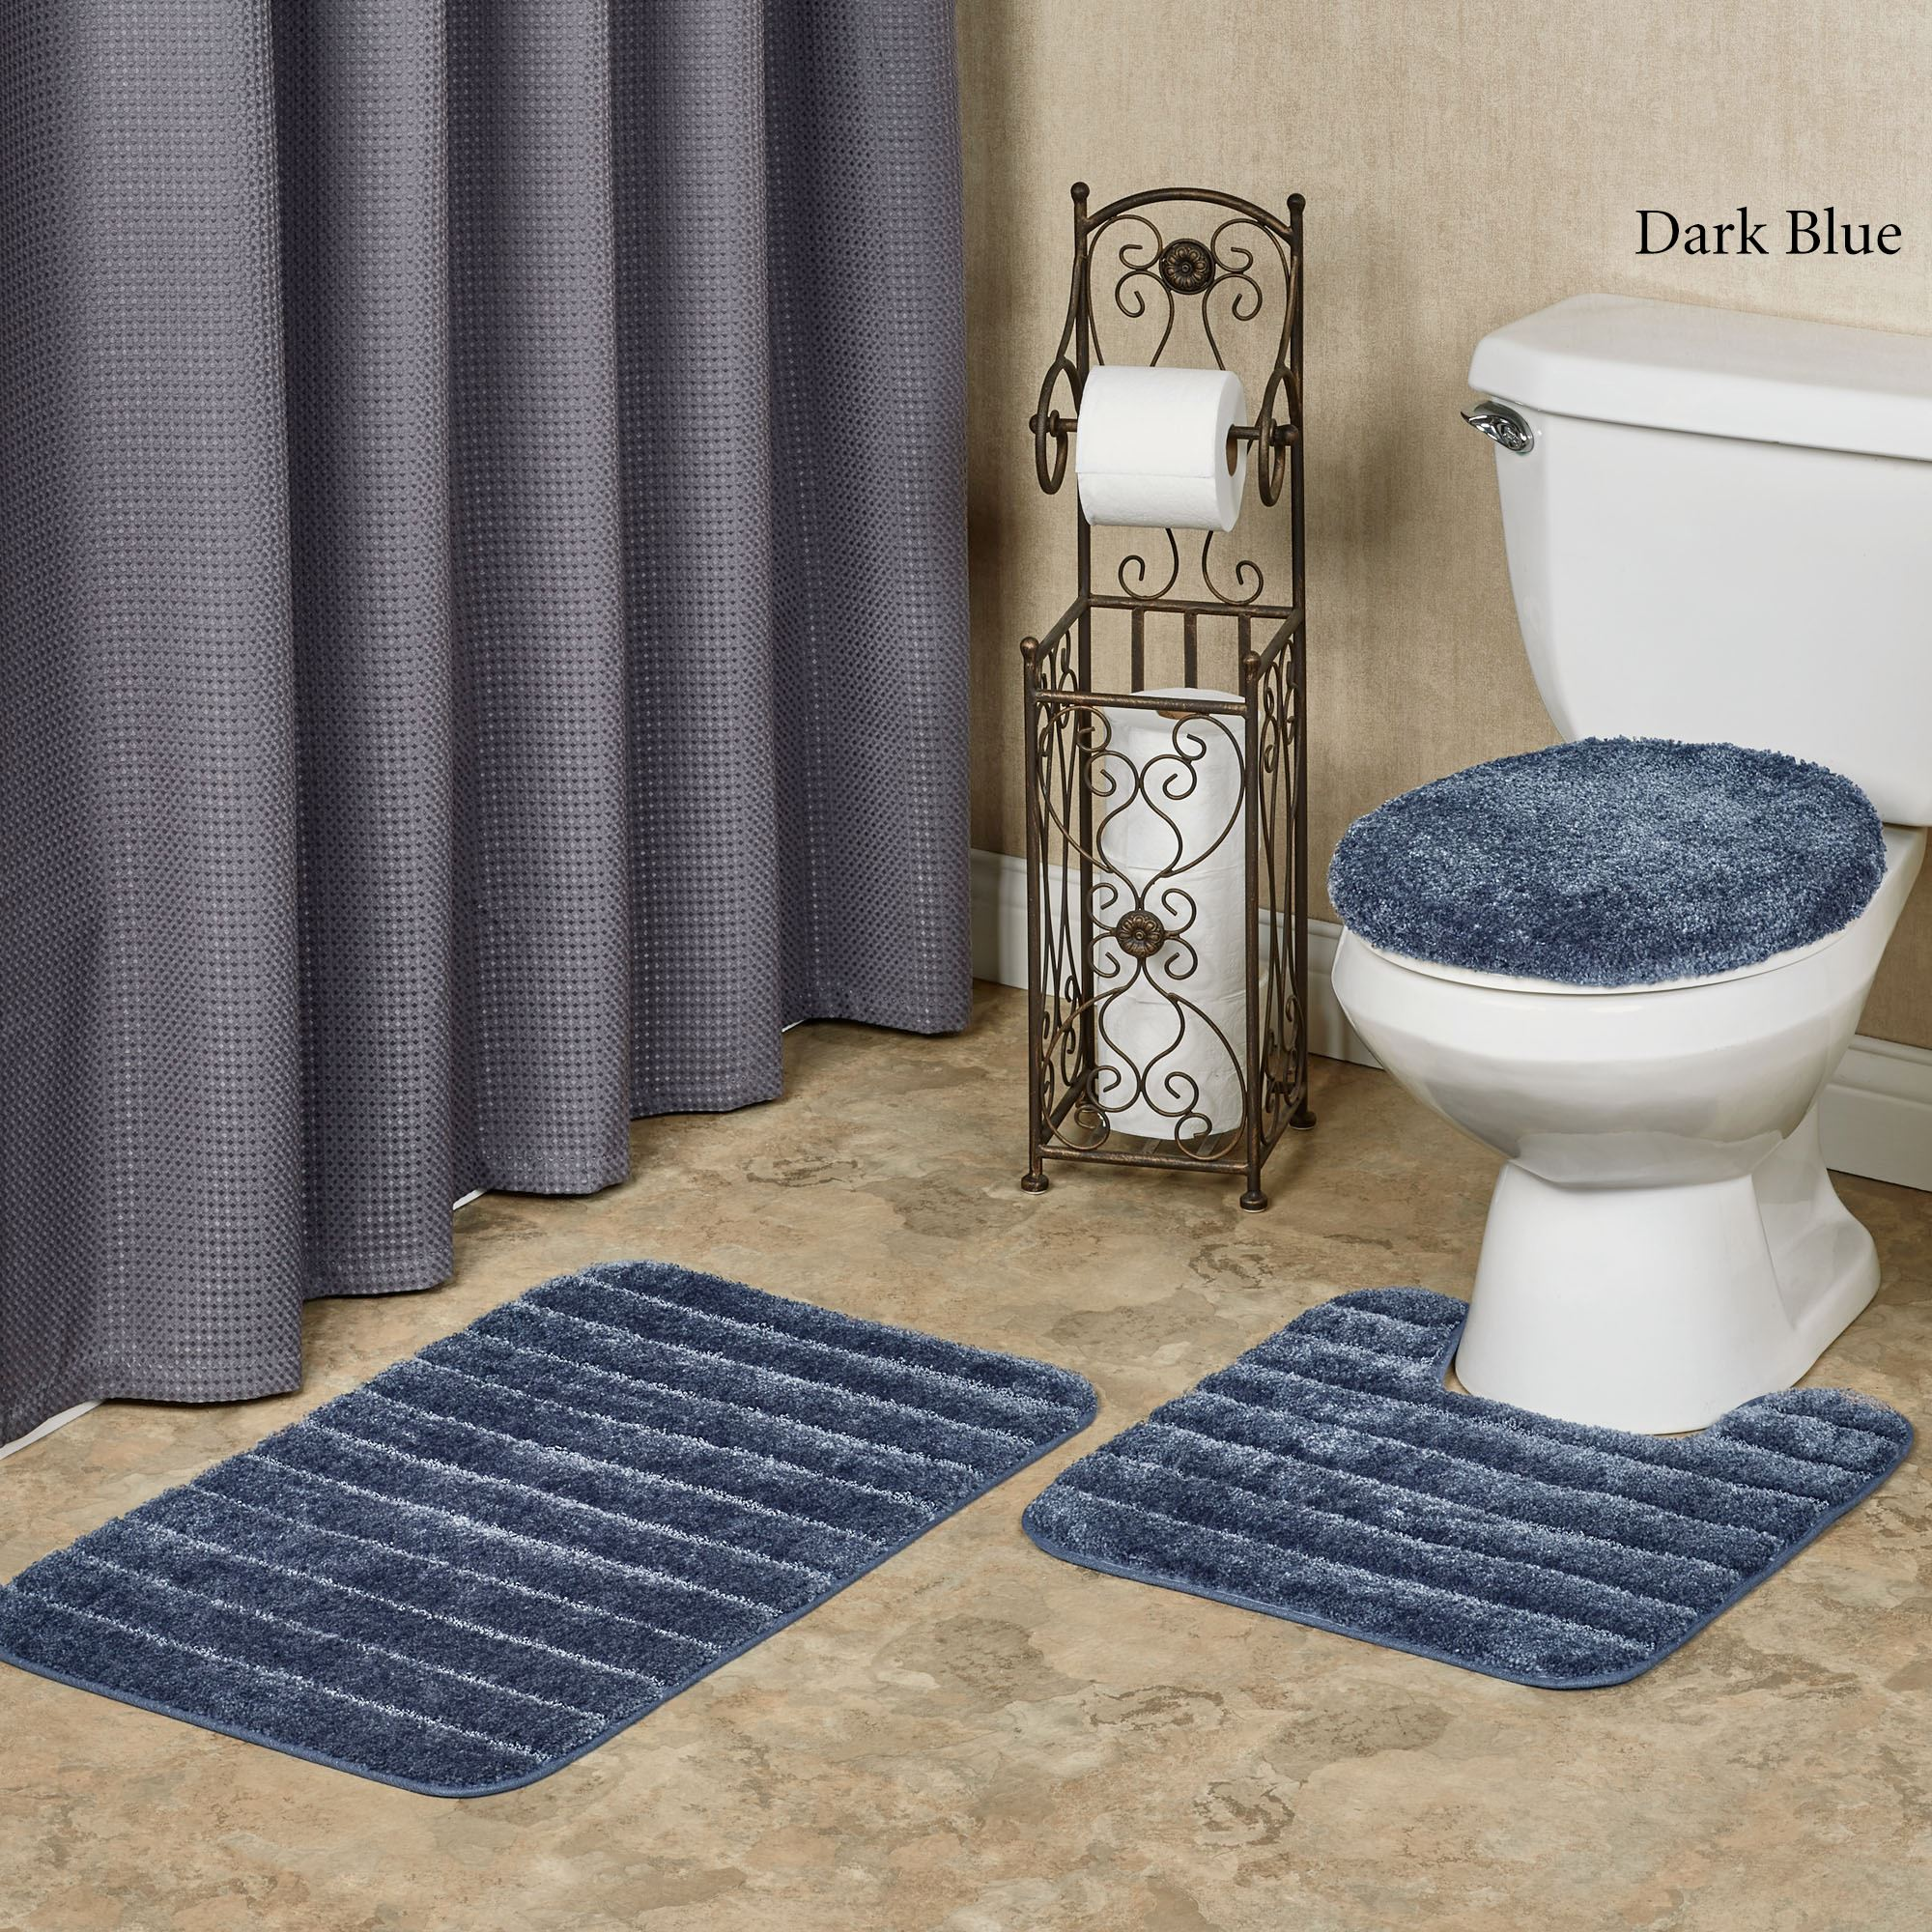 Veranda Plush Toilet Lid Cover and Bath Rugs Set